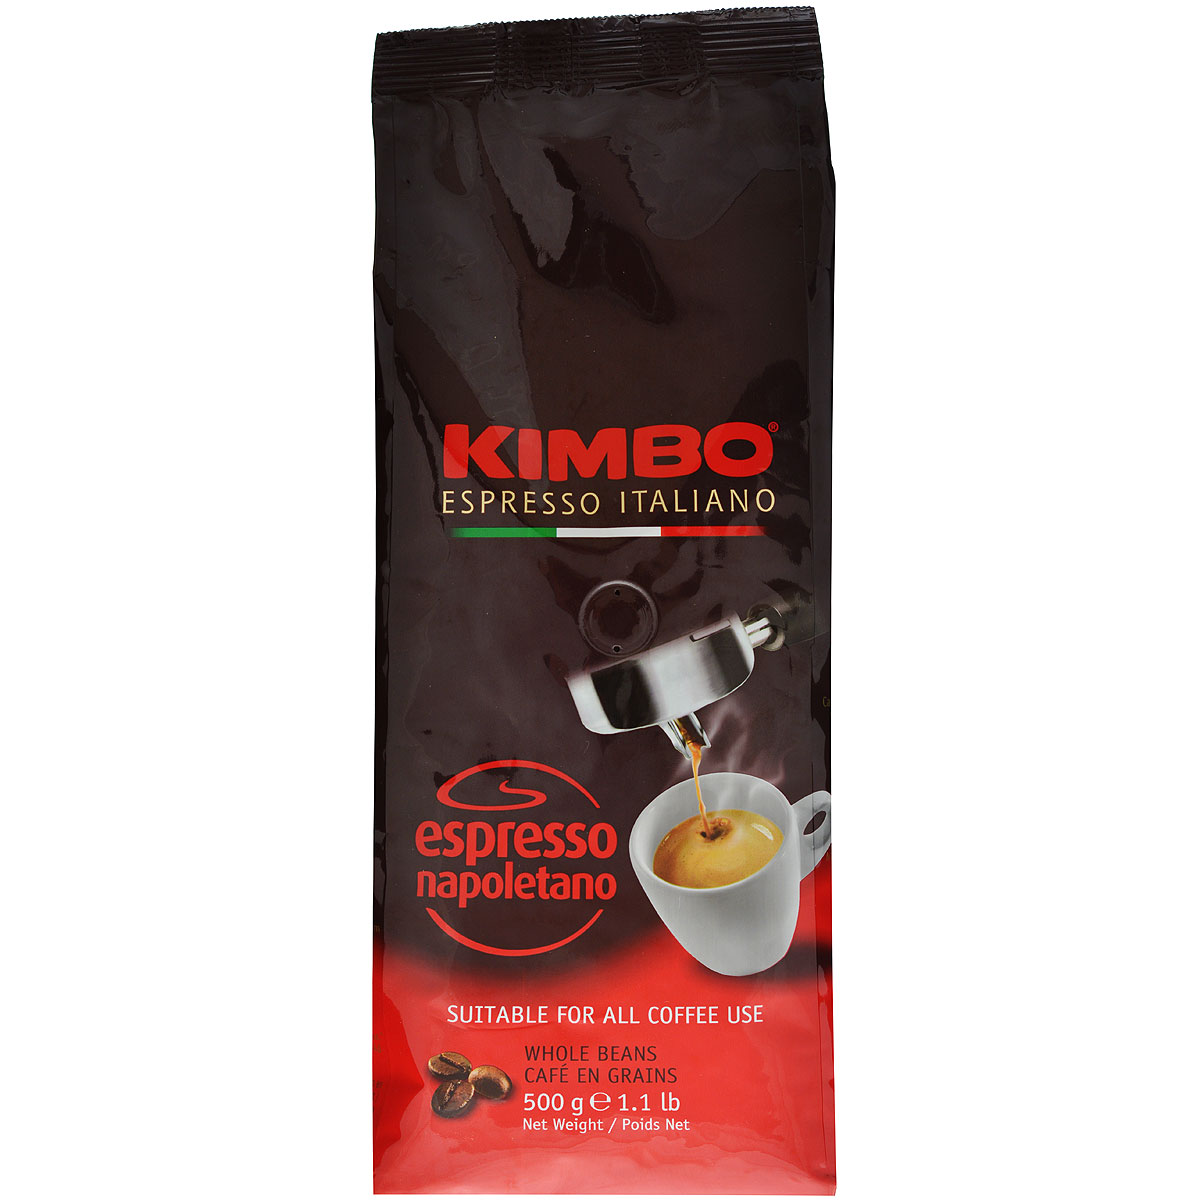 Kimbo Espresso Napoletano кофе в зернах, 500 г8002200602130